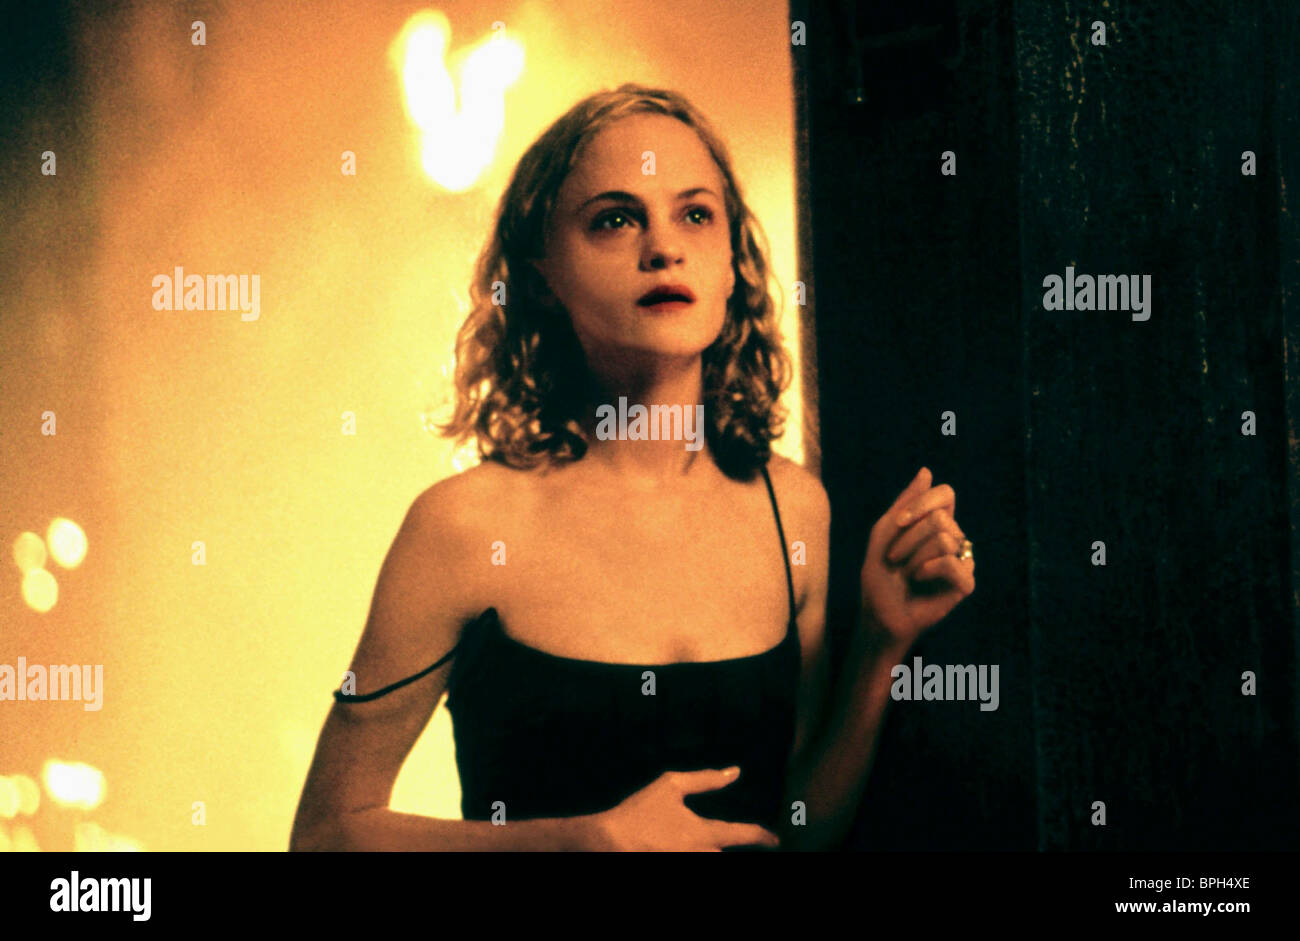 Marvelous Alejo (b. 1996),Bebe Neuwirth born December 31, 1958 (age 59) Sex movies Sasha Alexander born May 17, 1973 (age 45),Gabriella Wright